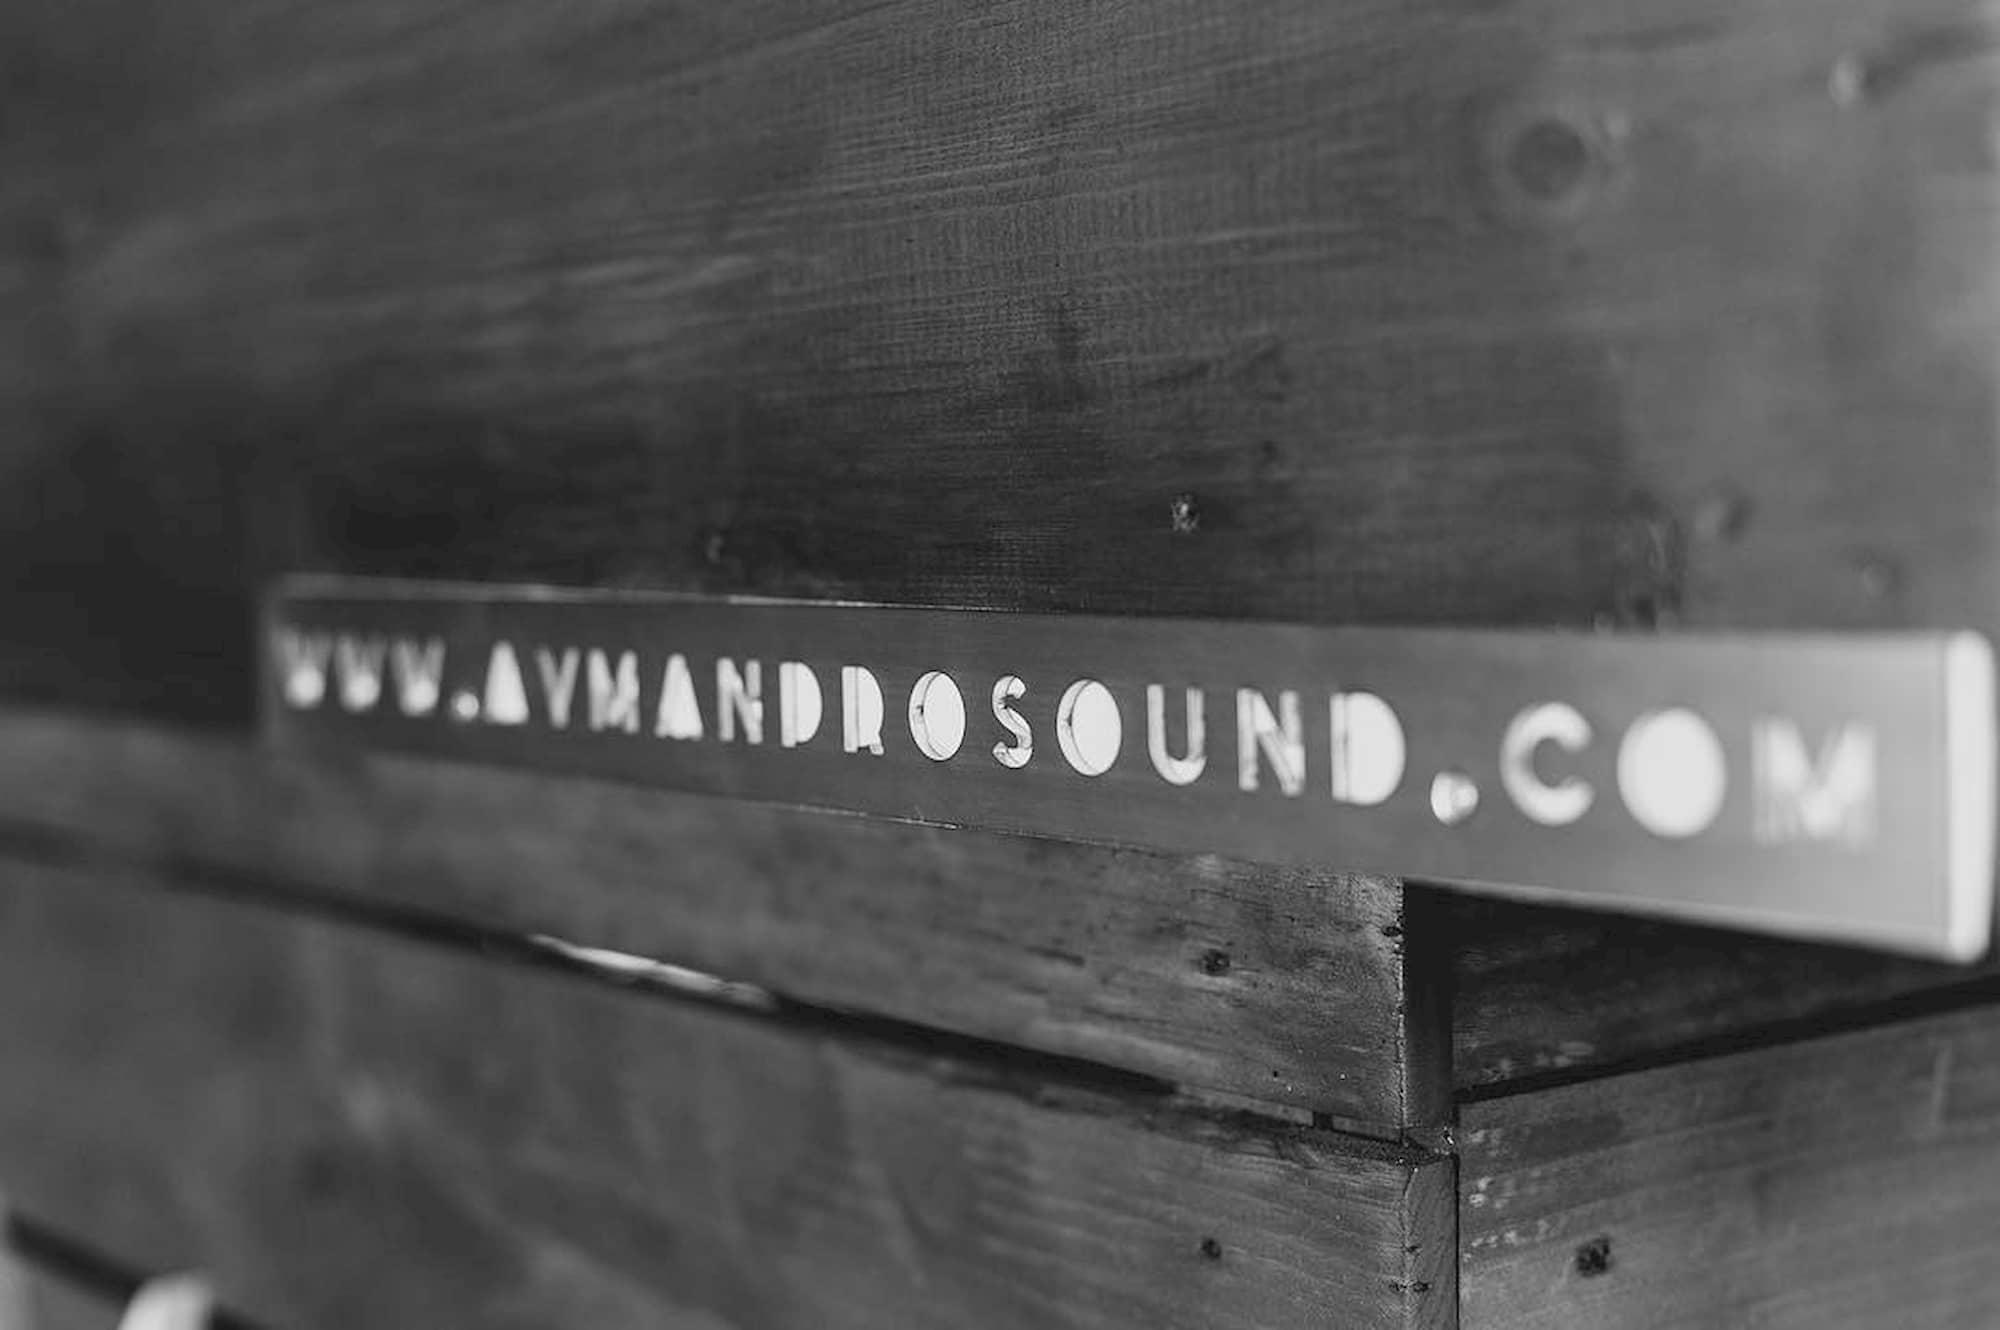 Cabina madera Ayman Prosound